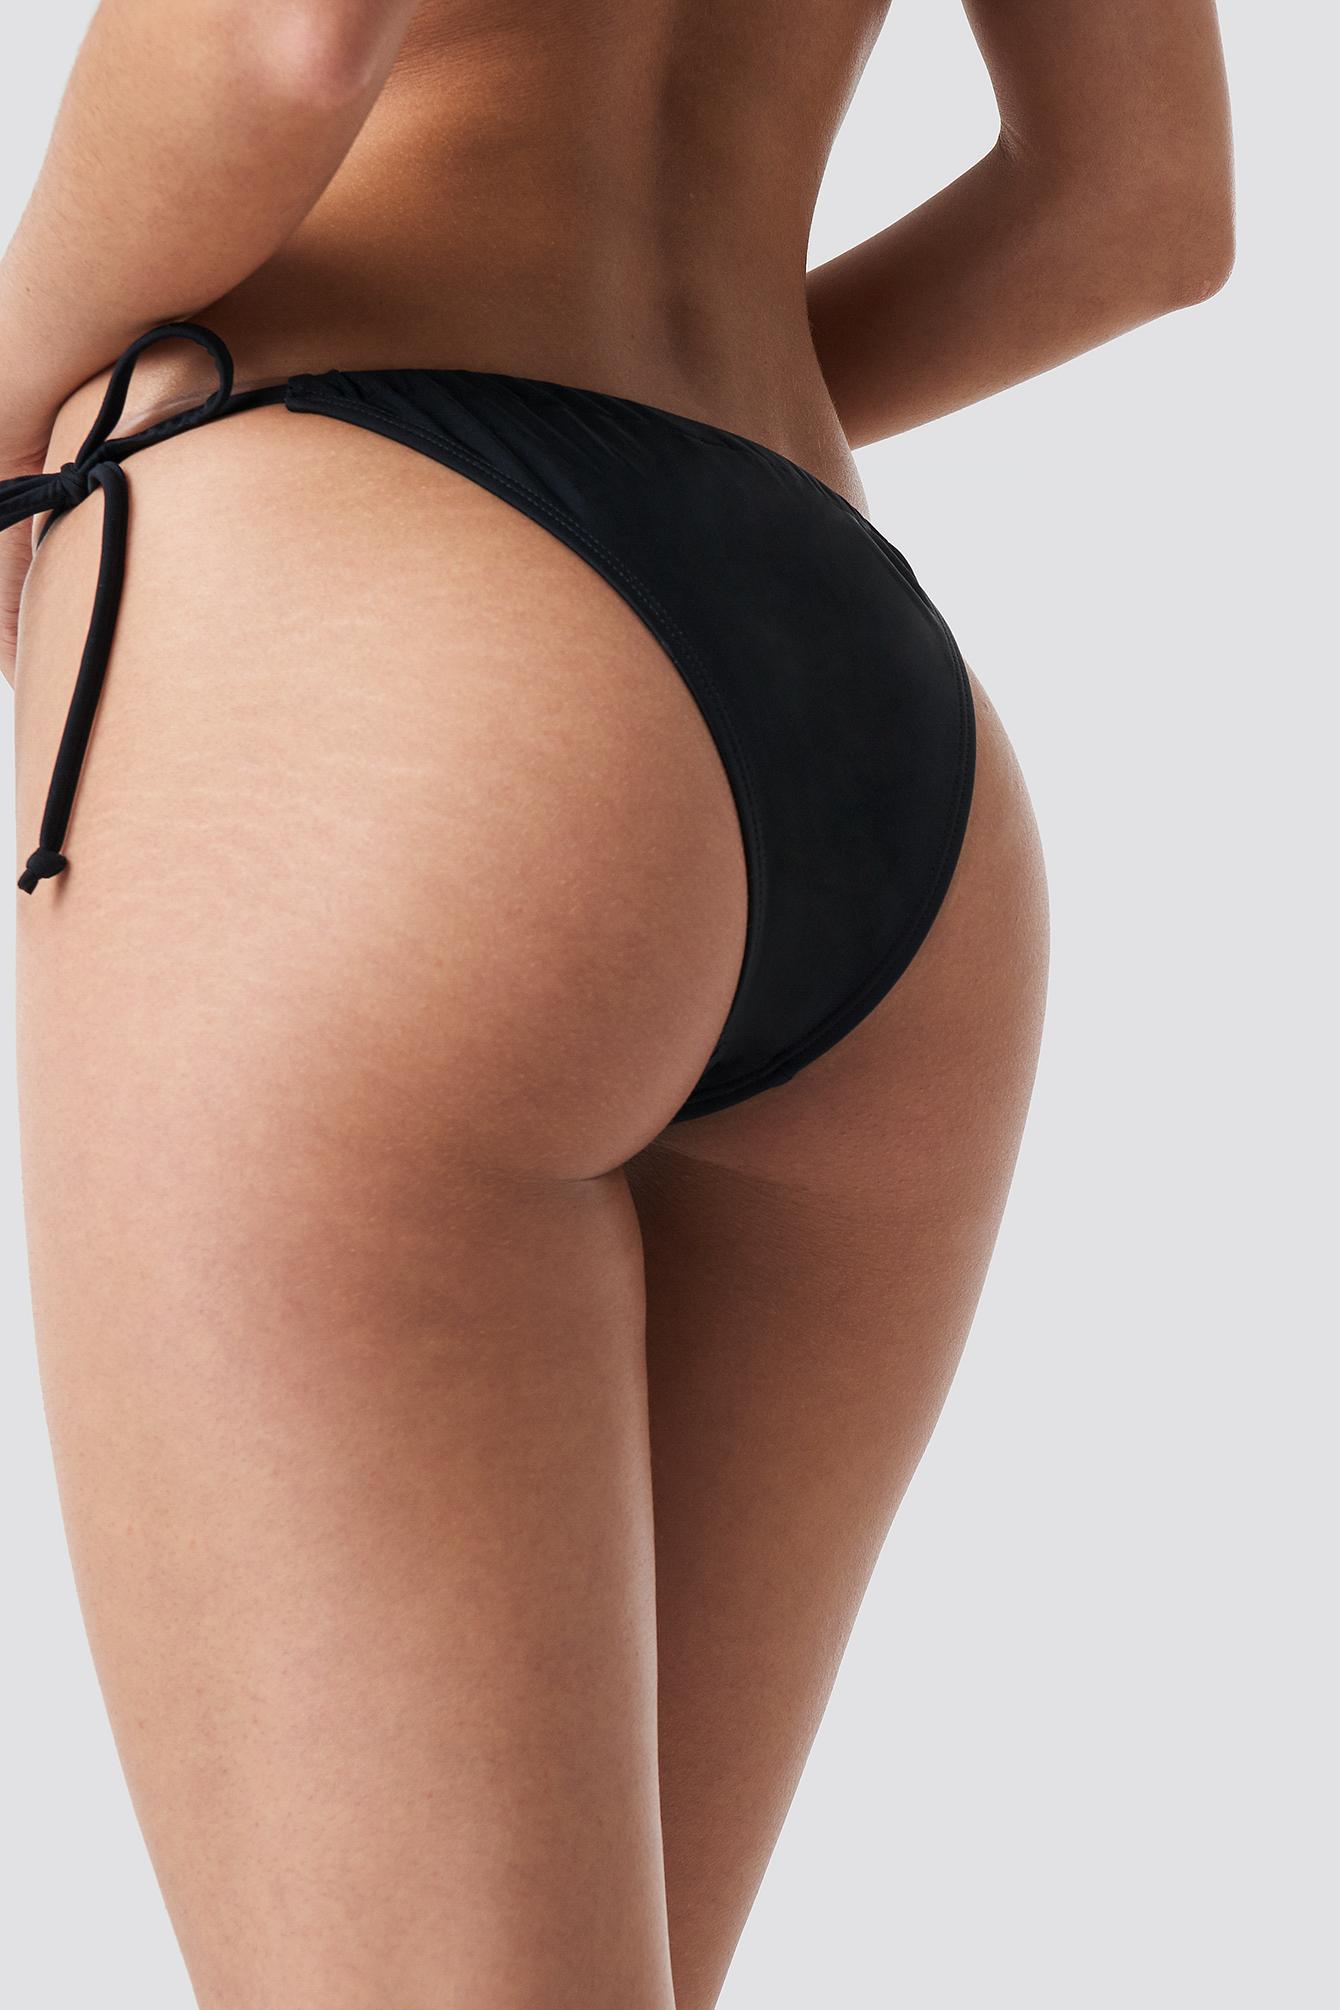 Drawstring Triangle Panty NA-KD.COM